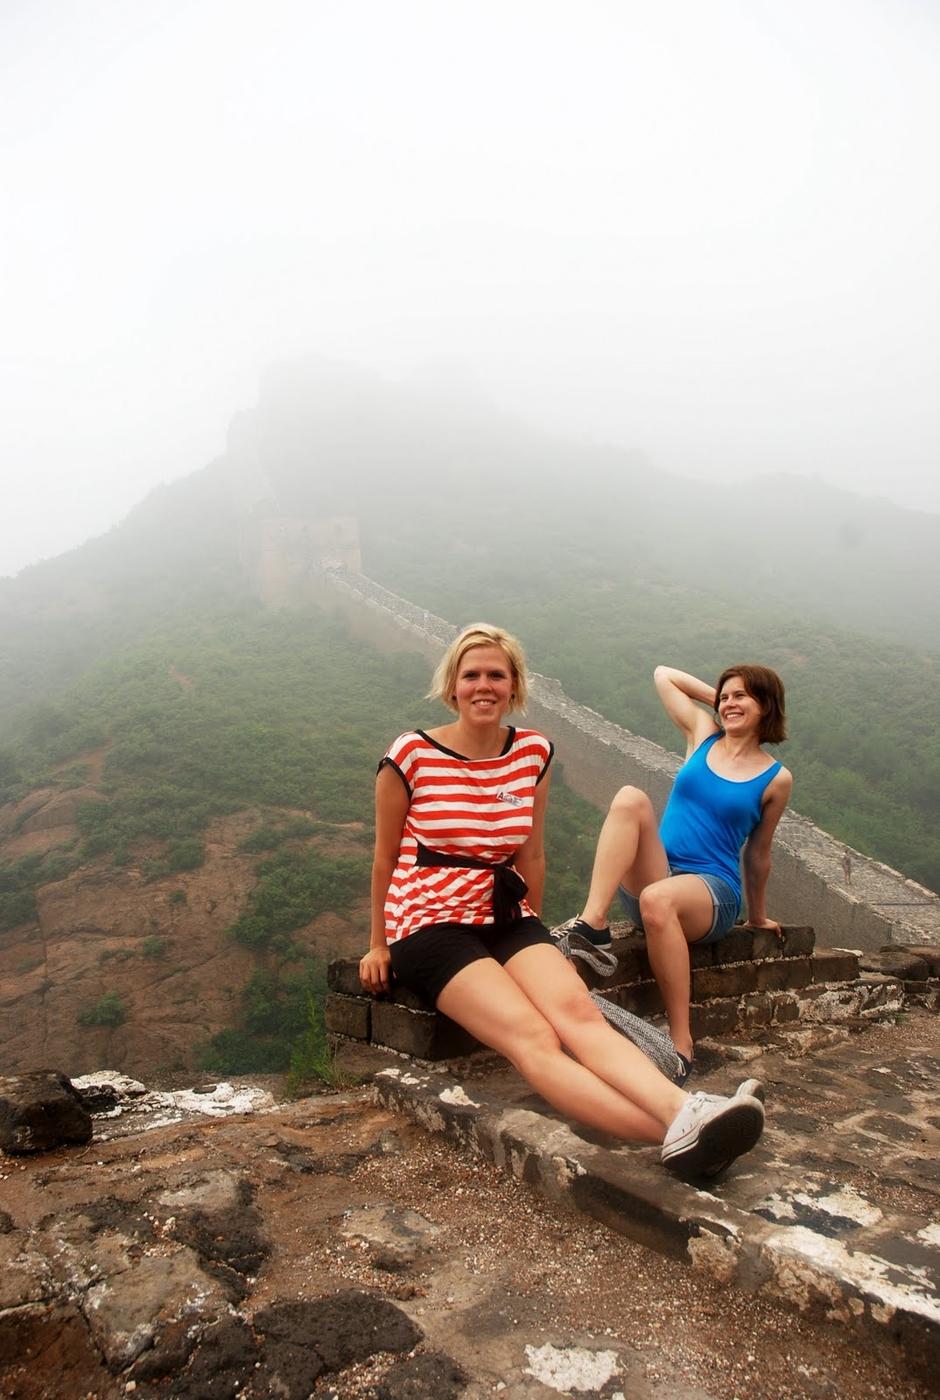 kiinan muuri.jpg